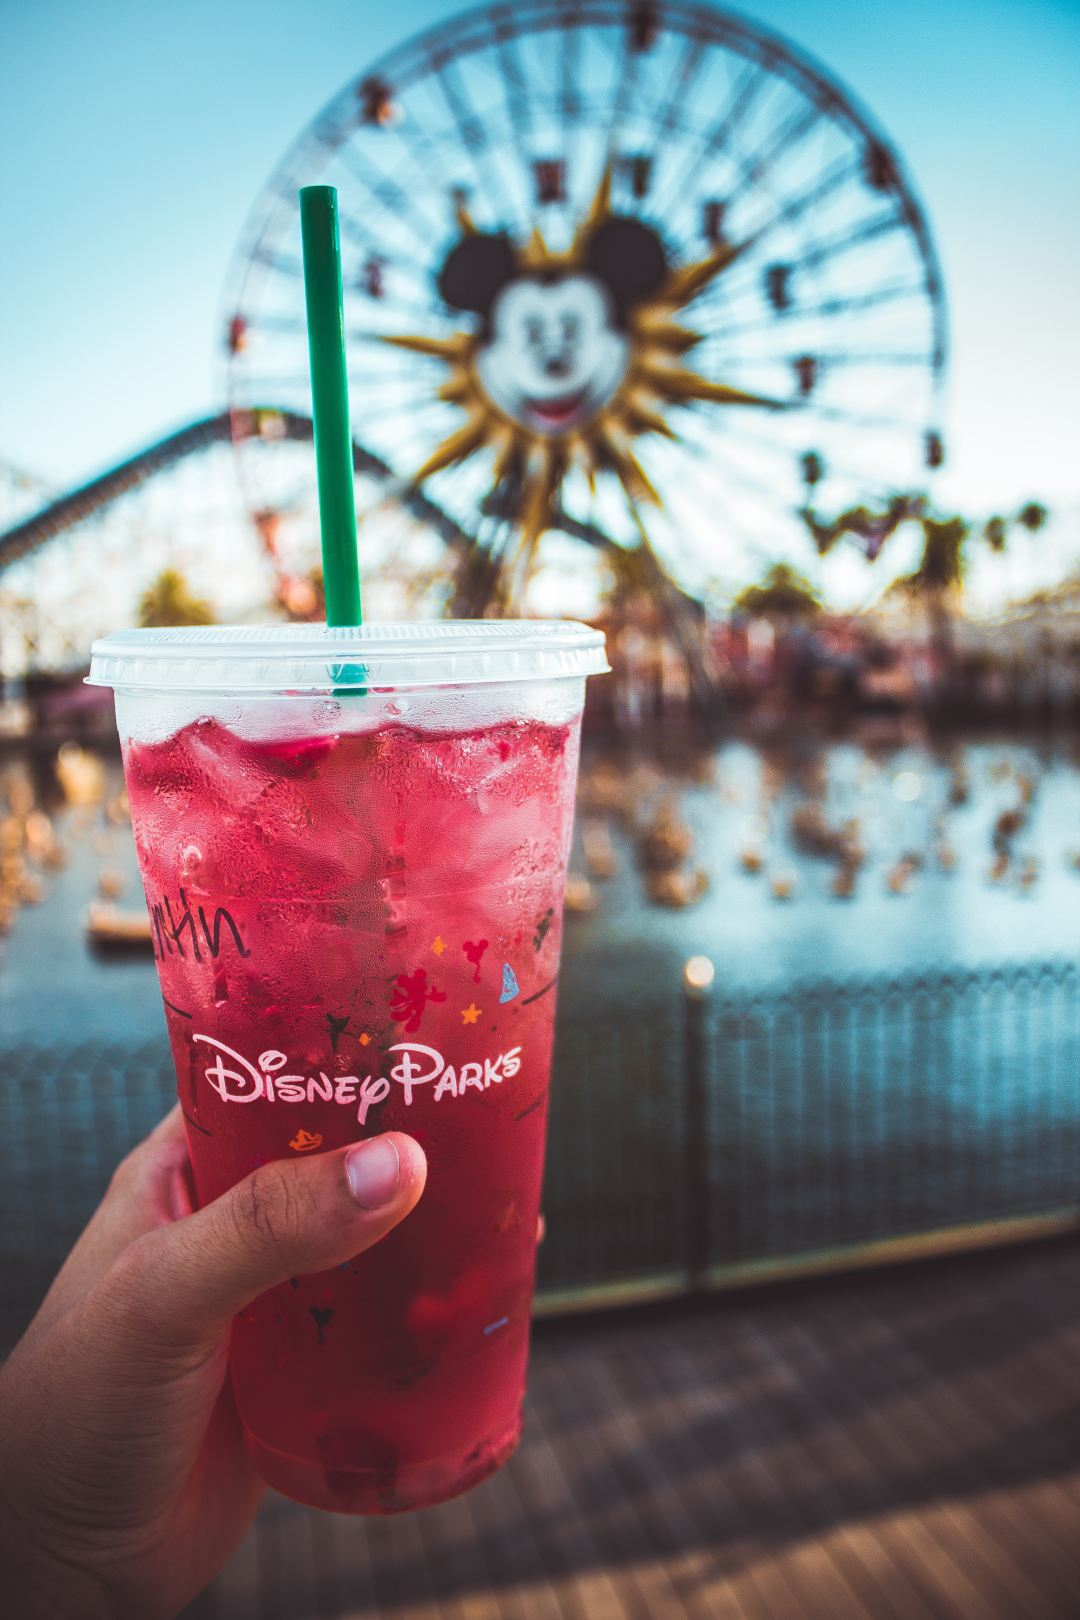 Disneyland Paris Snacks that Top Our List of Favourites